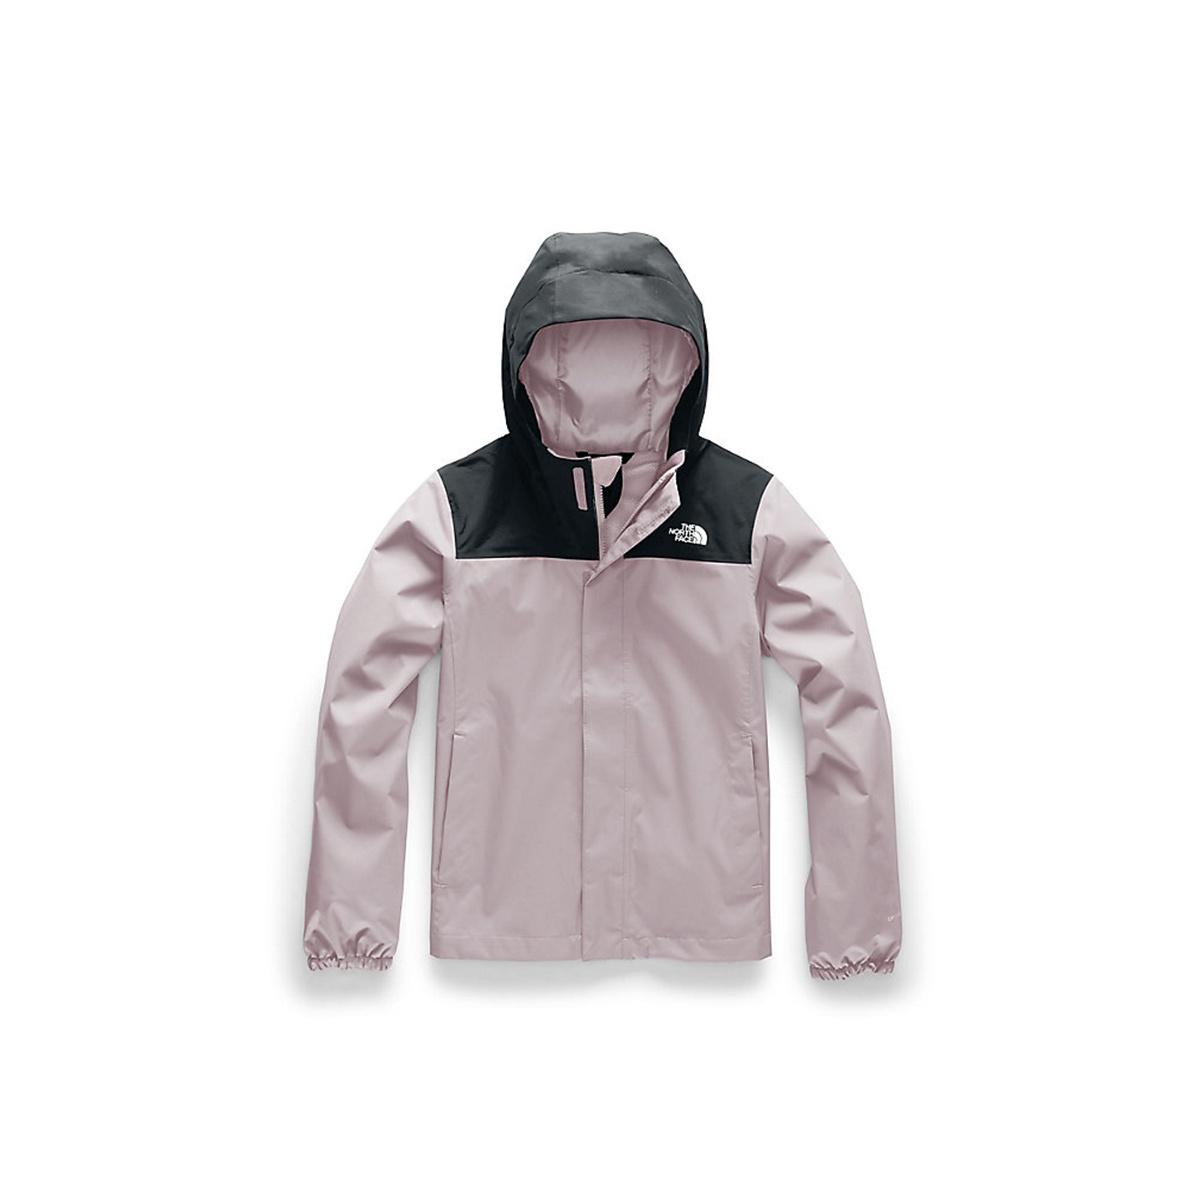 d7dde2c6d The North Face G Resolve Reflective Jacket